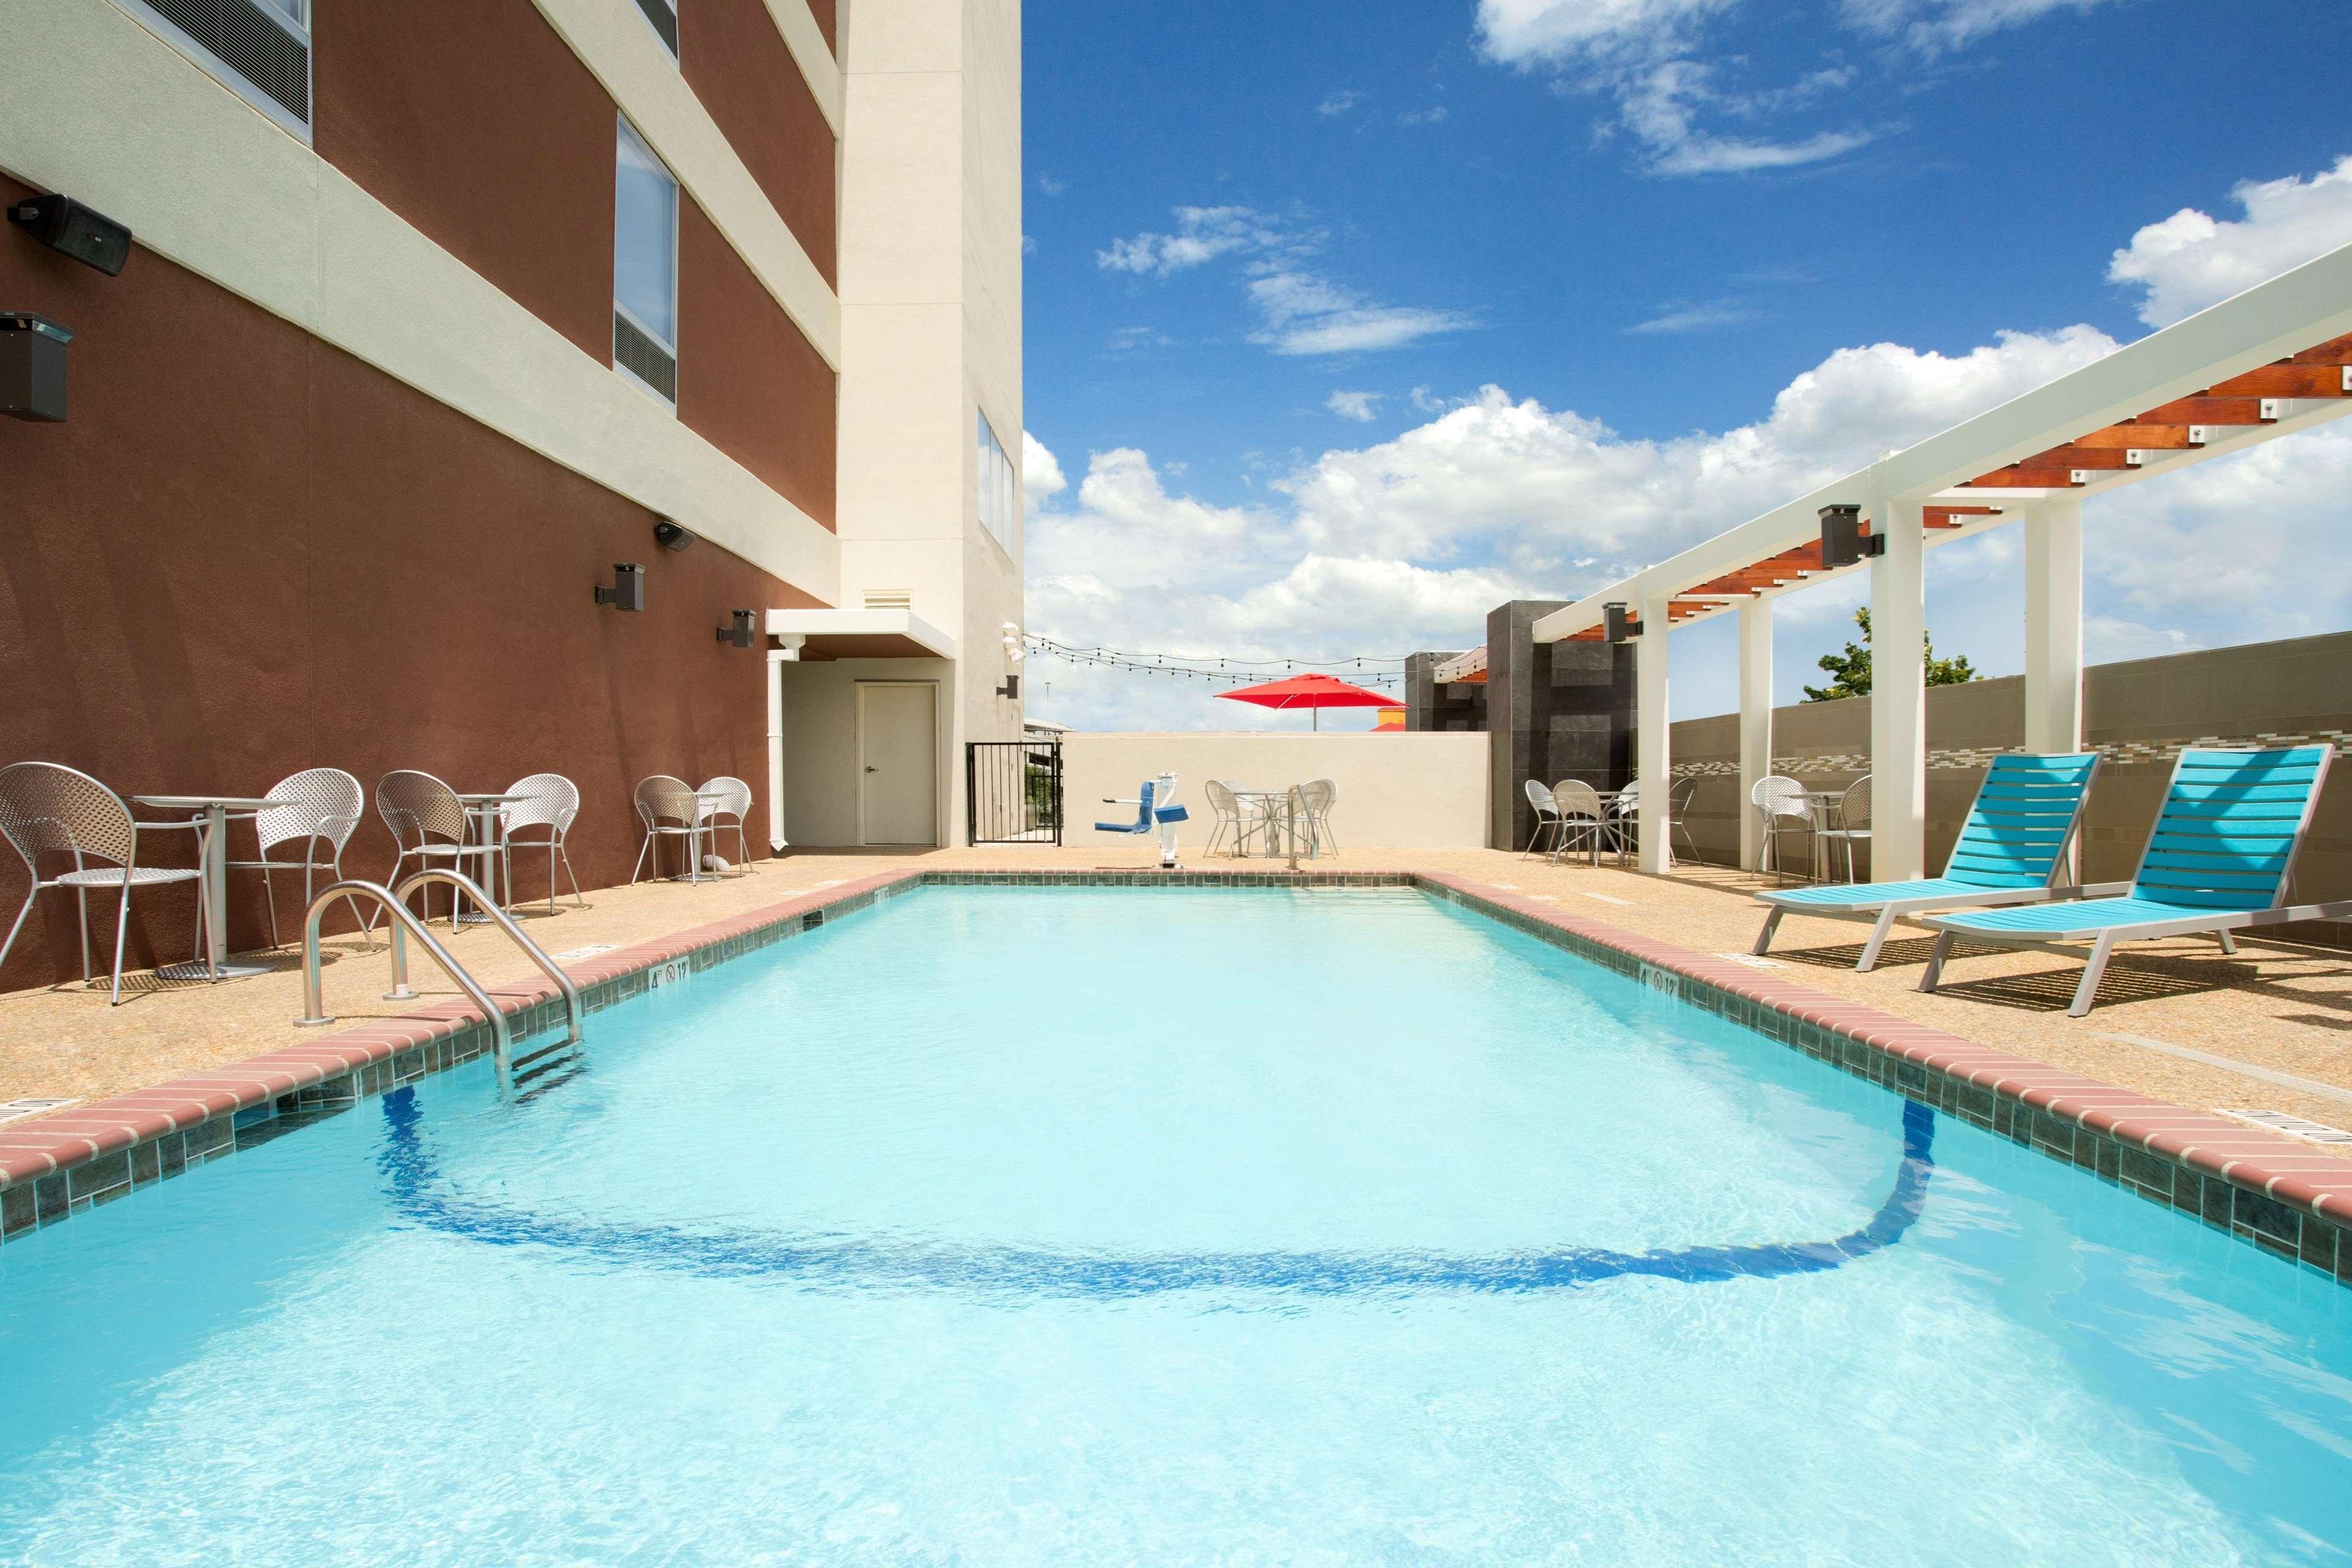 Home2 Suites by Hilton San Antonio Airport, TX image 7